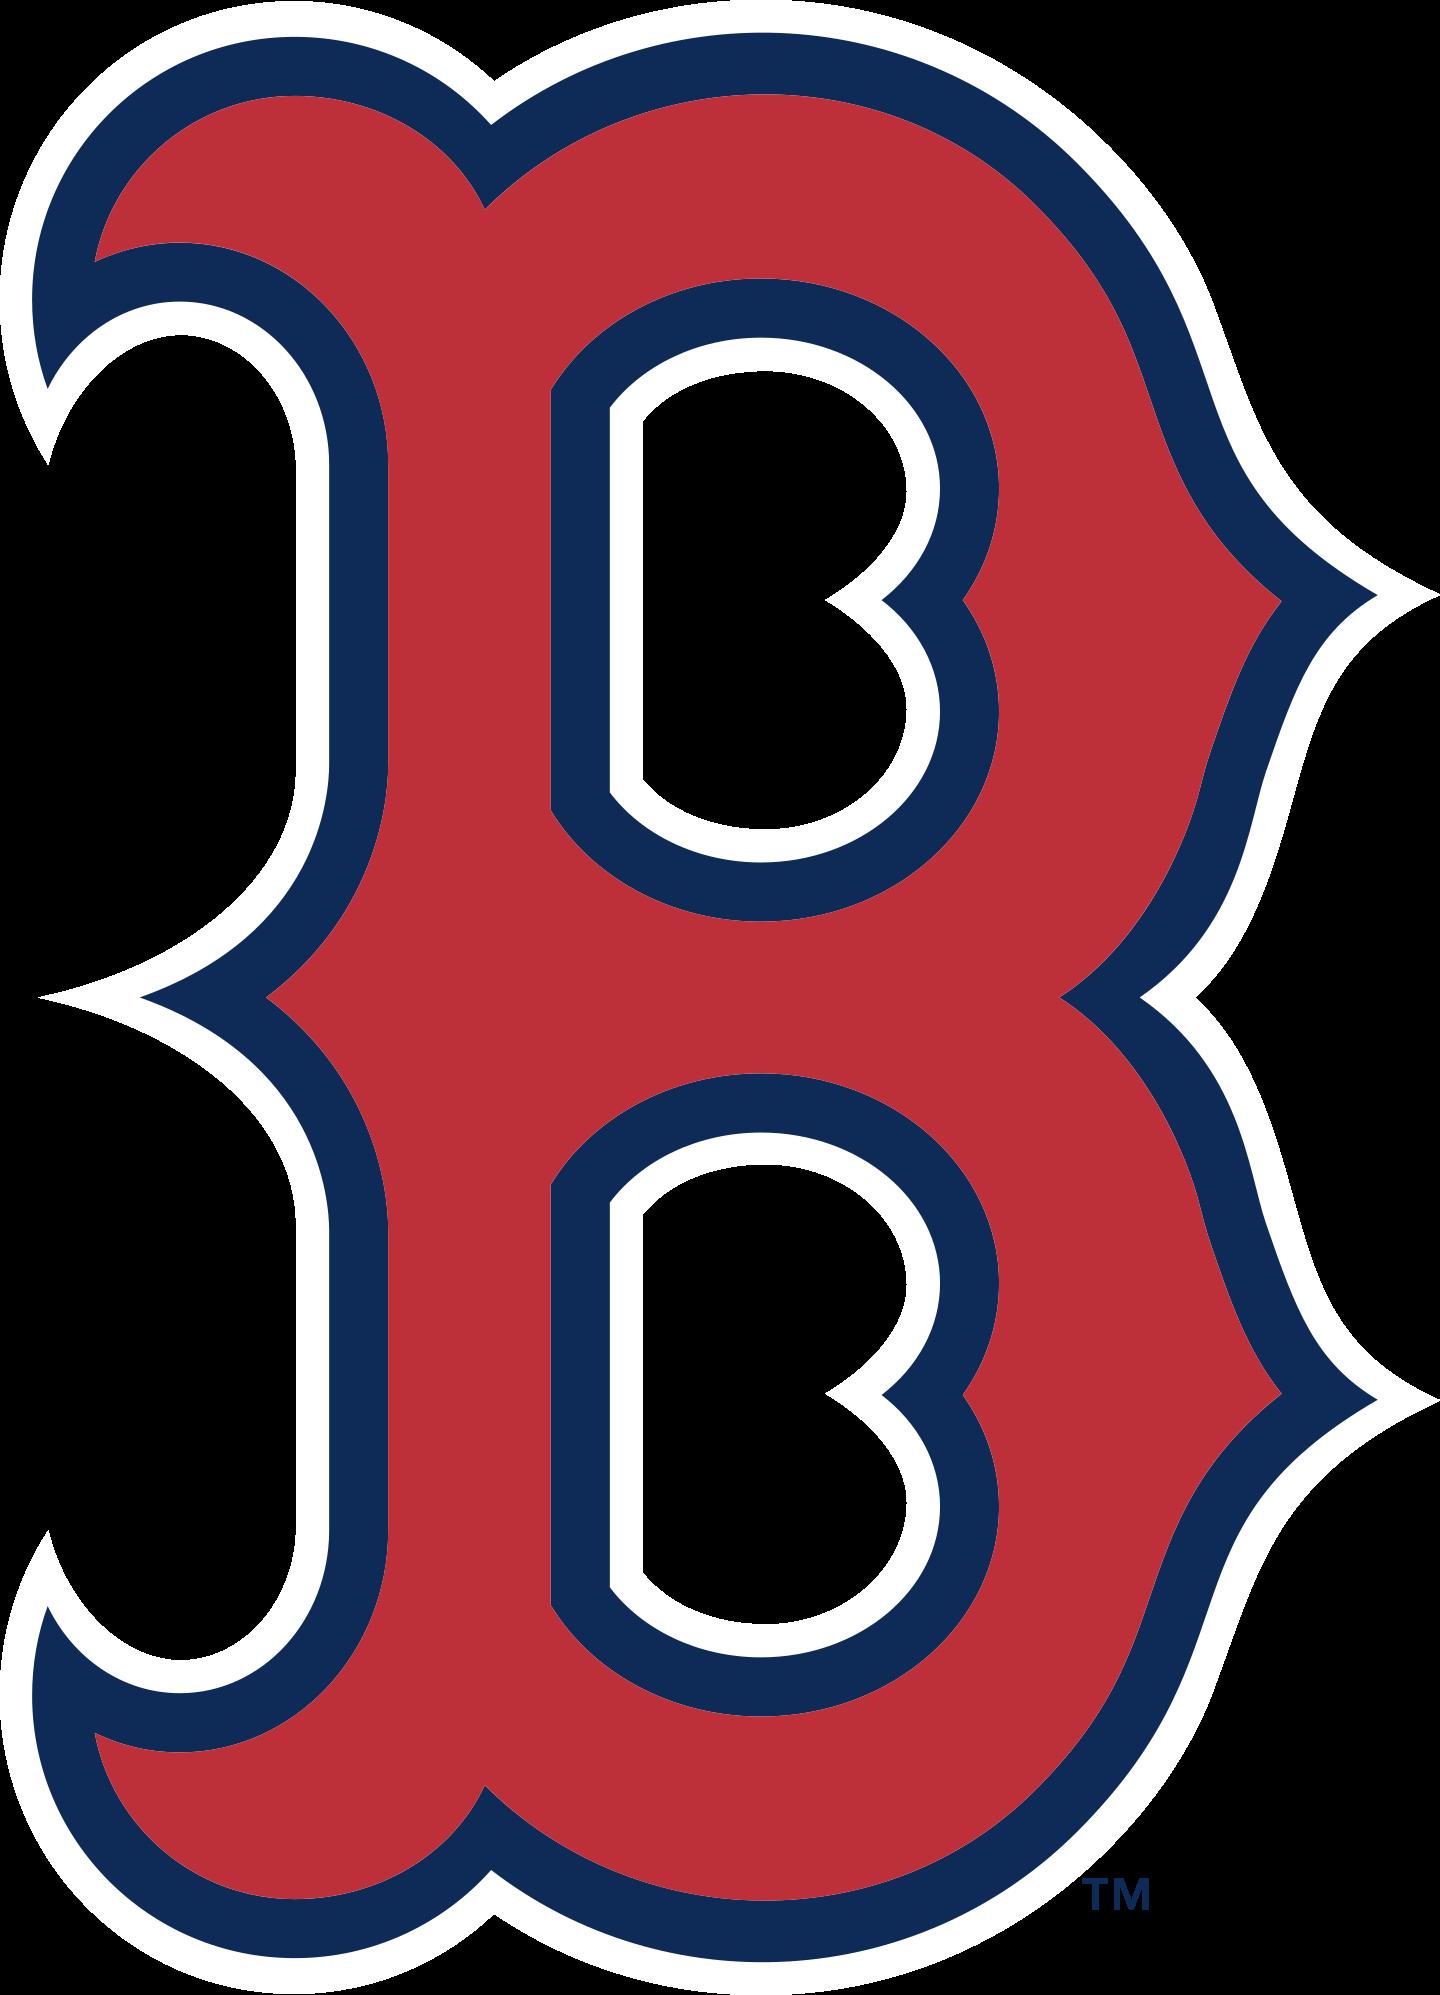 boston red sox logo 2 - Boston Red Sox Logo